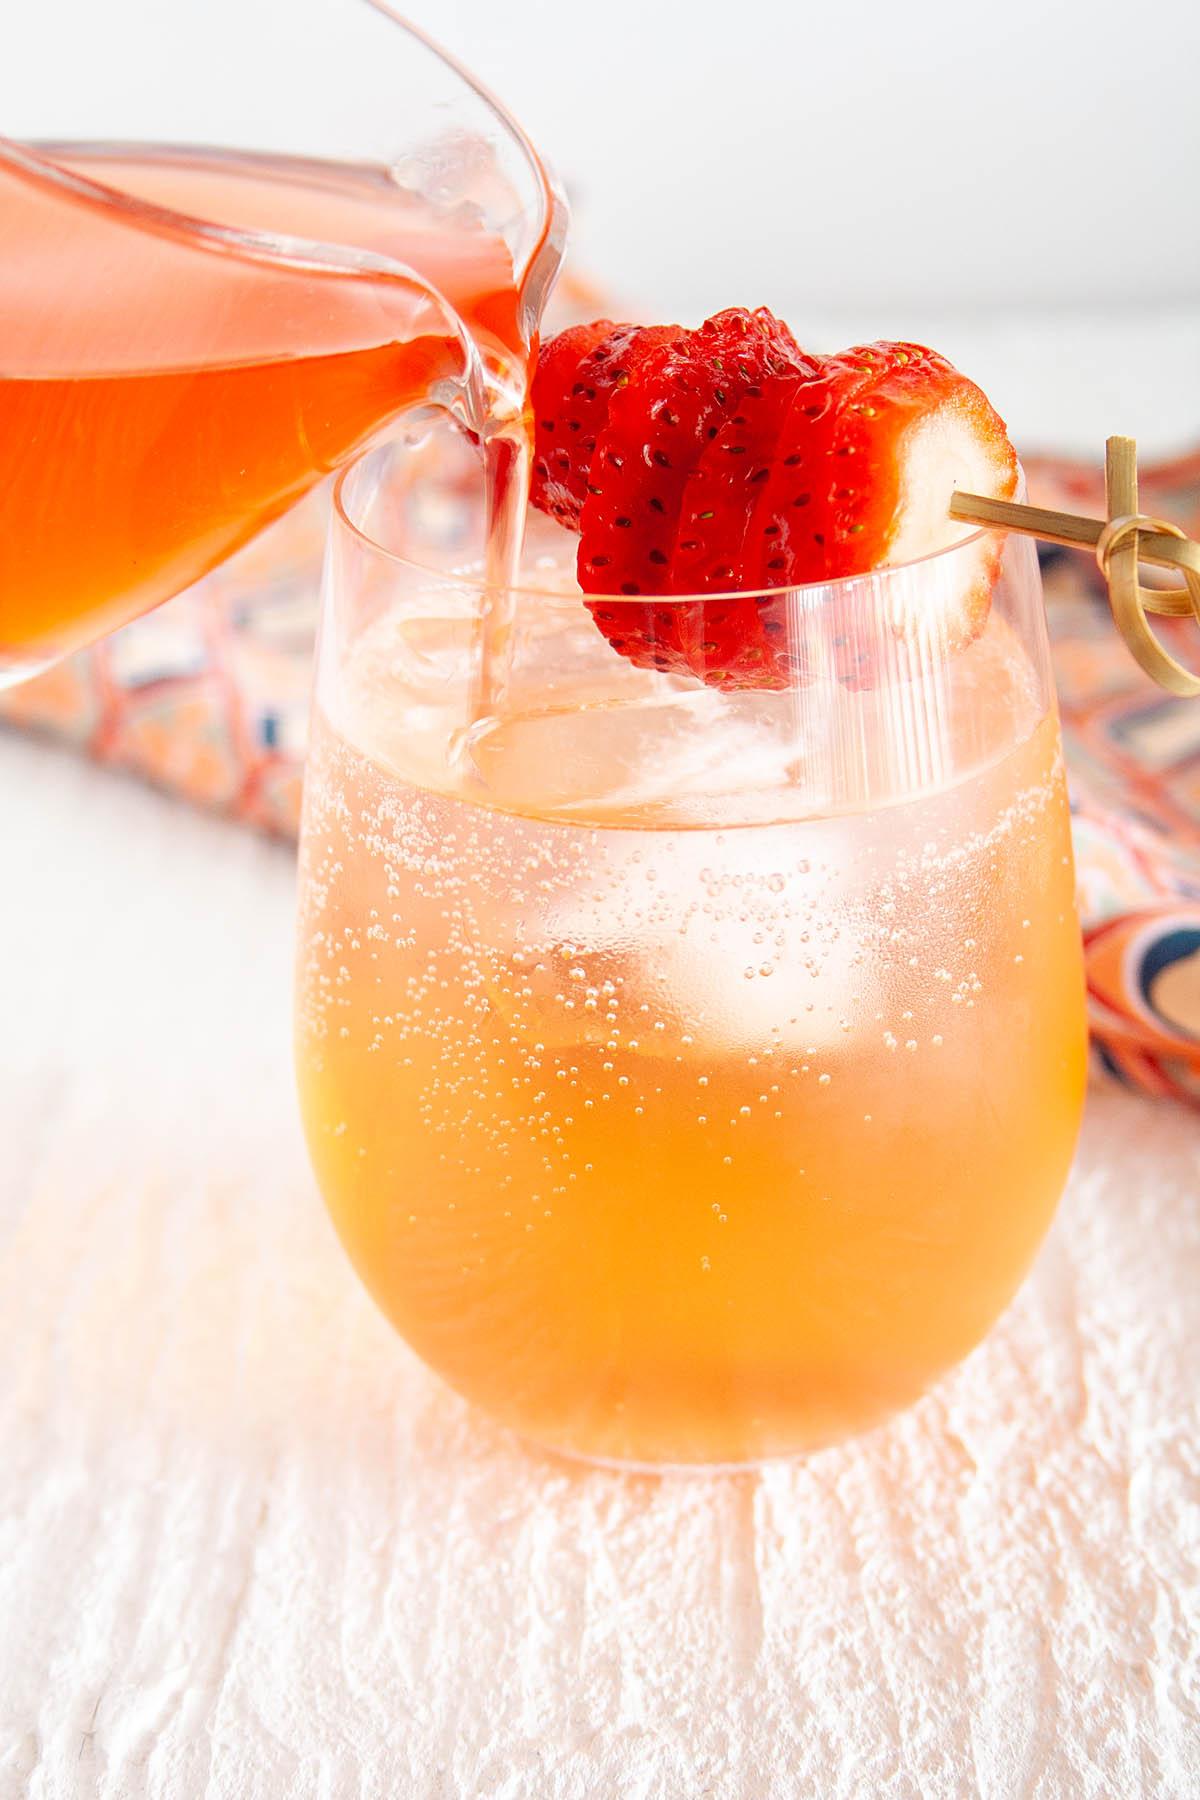 Strawberry Shrub being poured into glass with club soda.